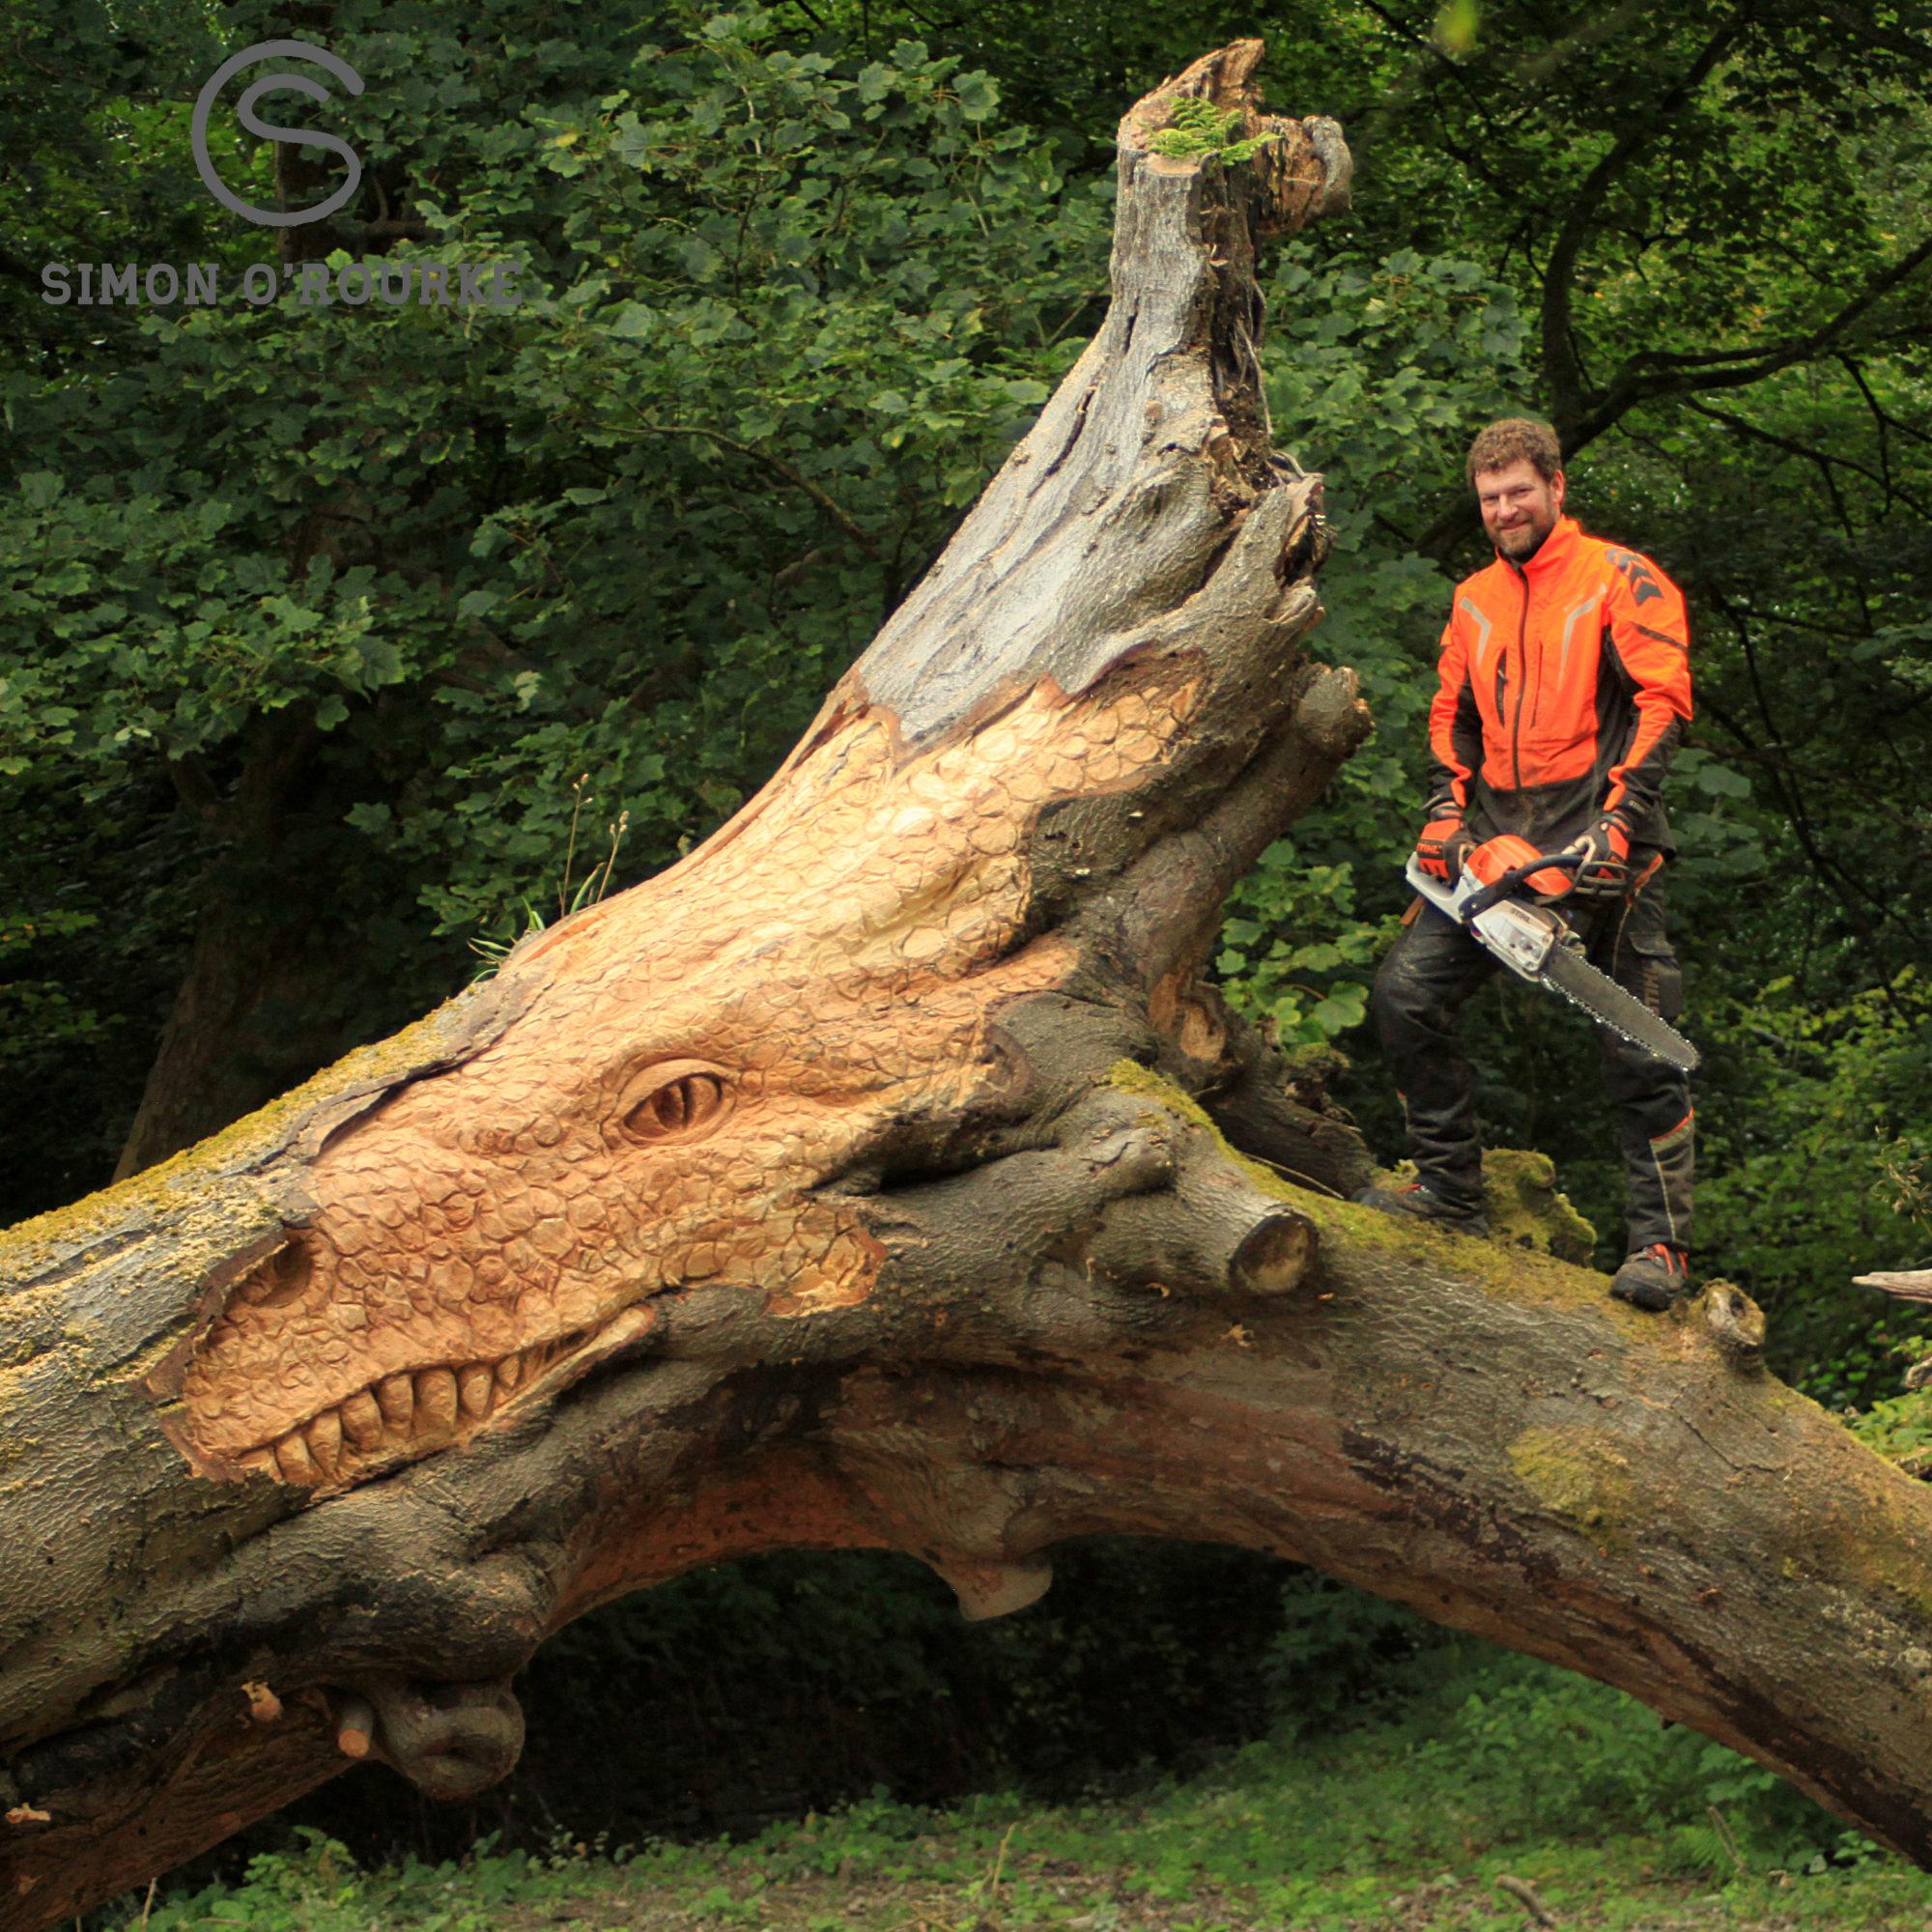 Carving a dragon into a fallen tree